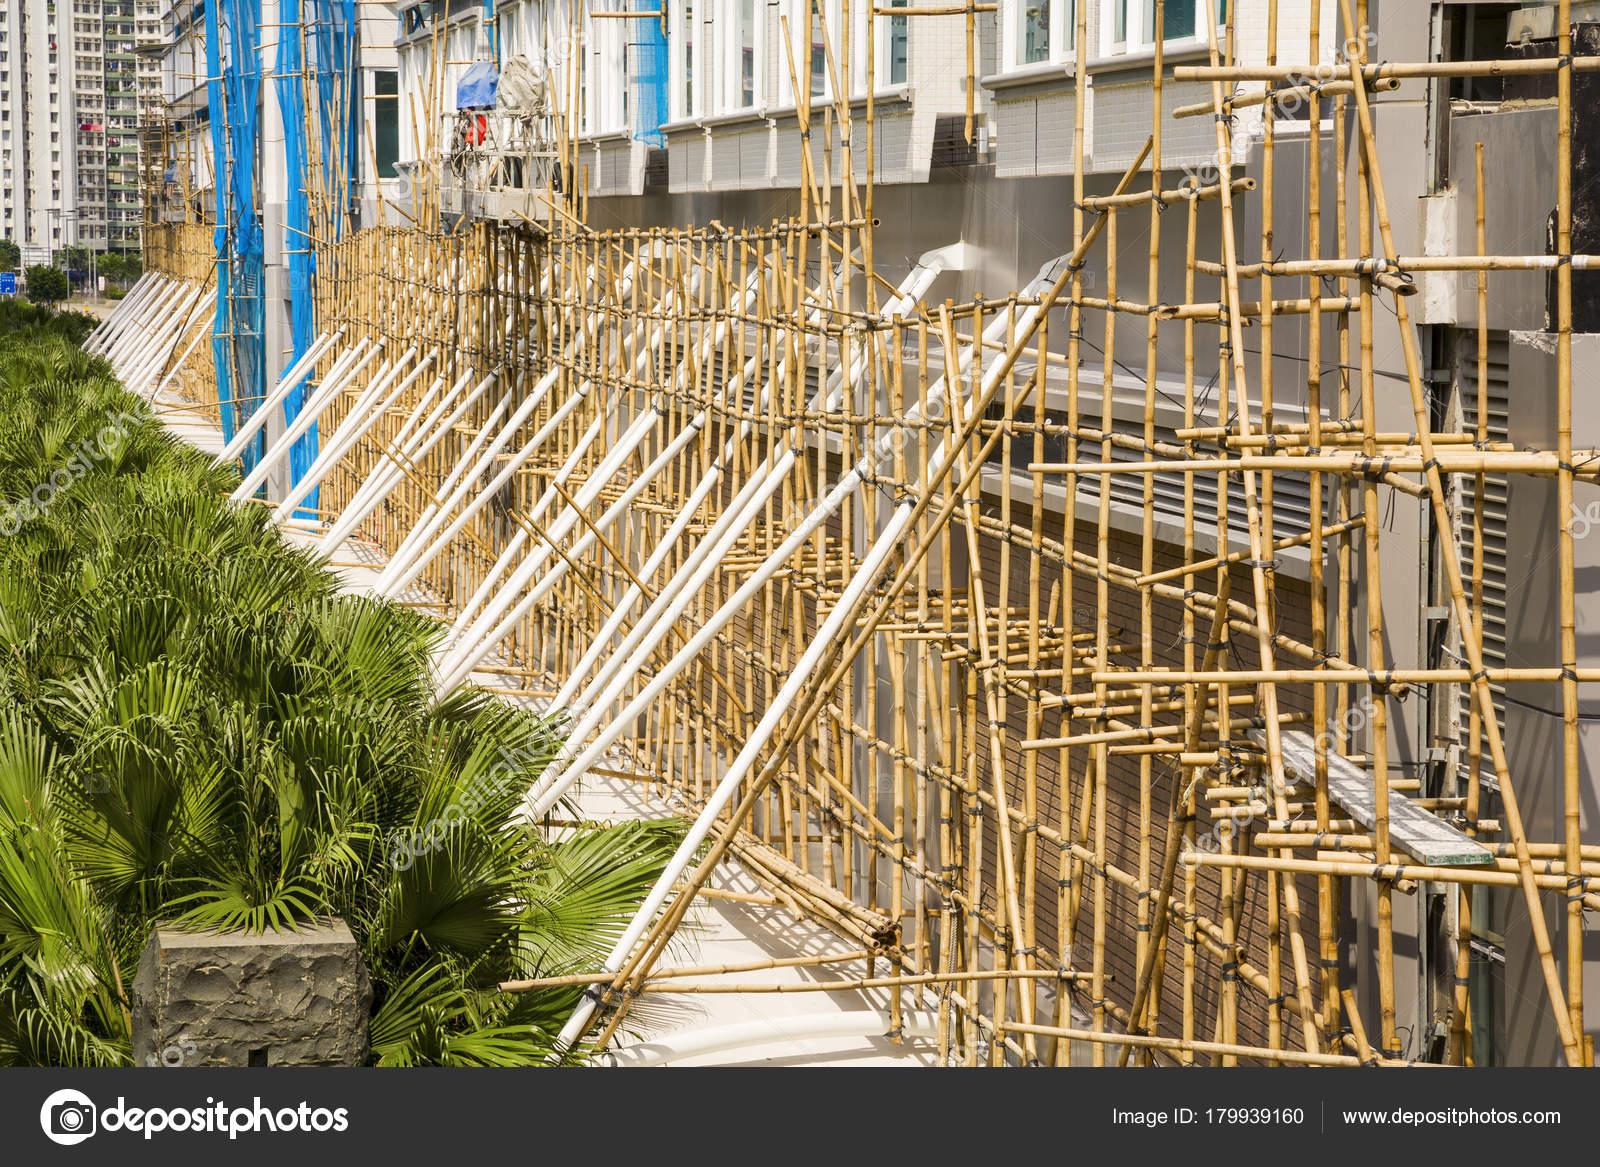 Hong Kong Bambus Gerust Baustelle Stockfoto C Travellinglight